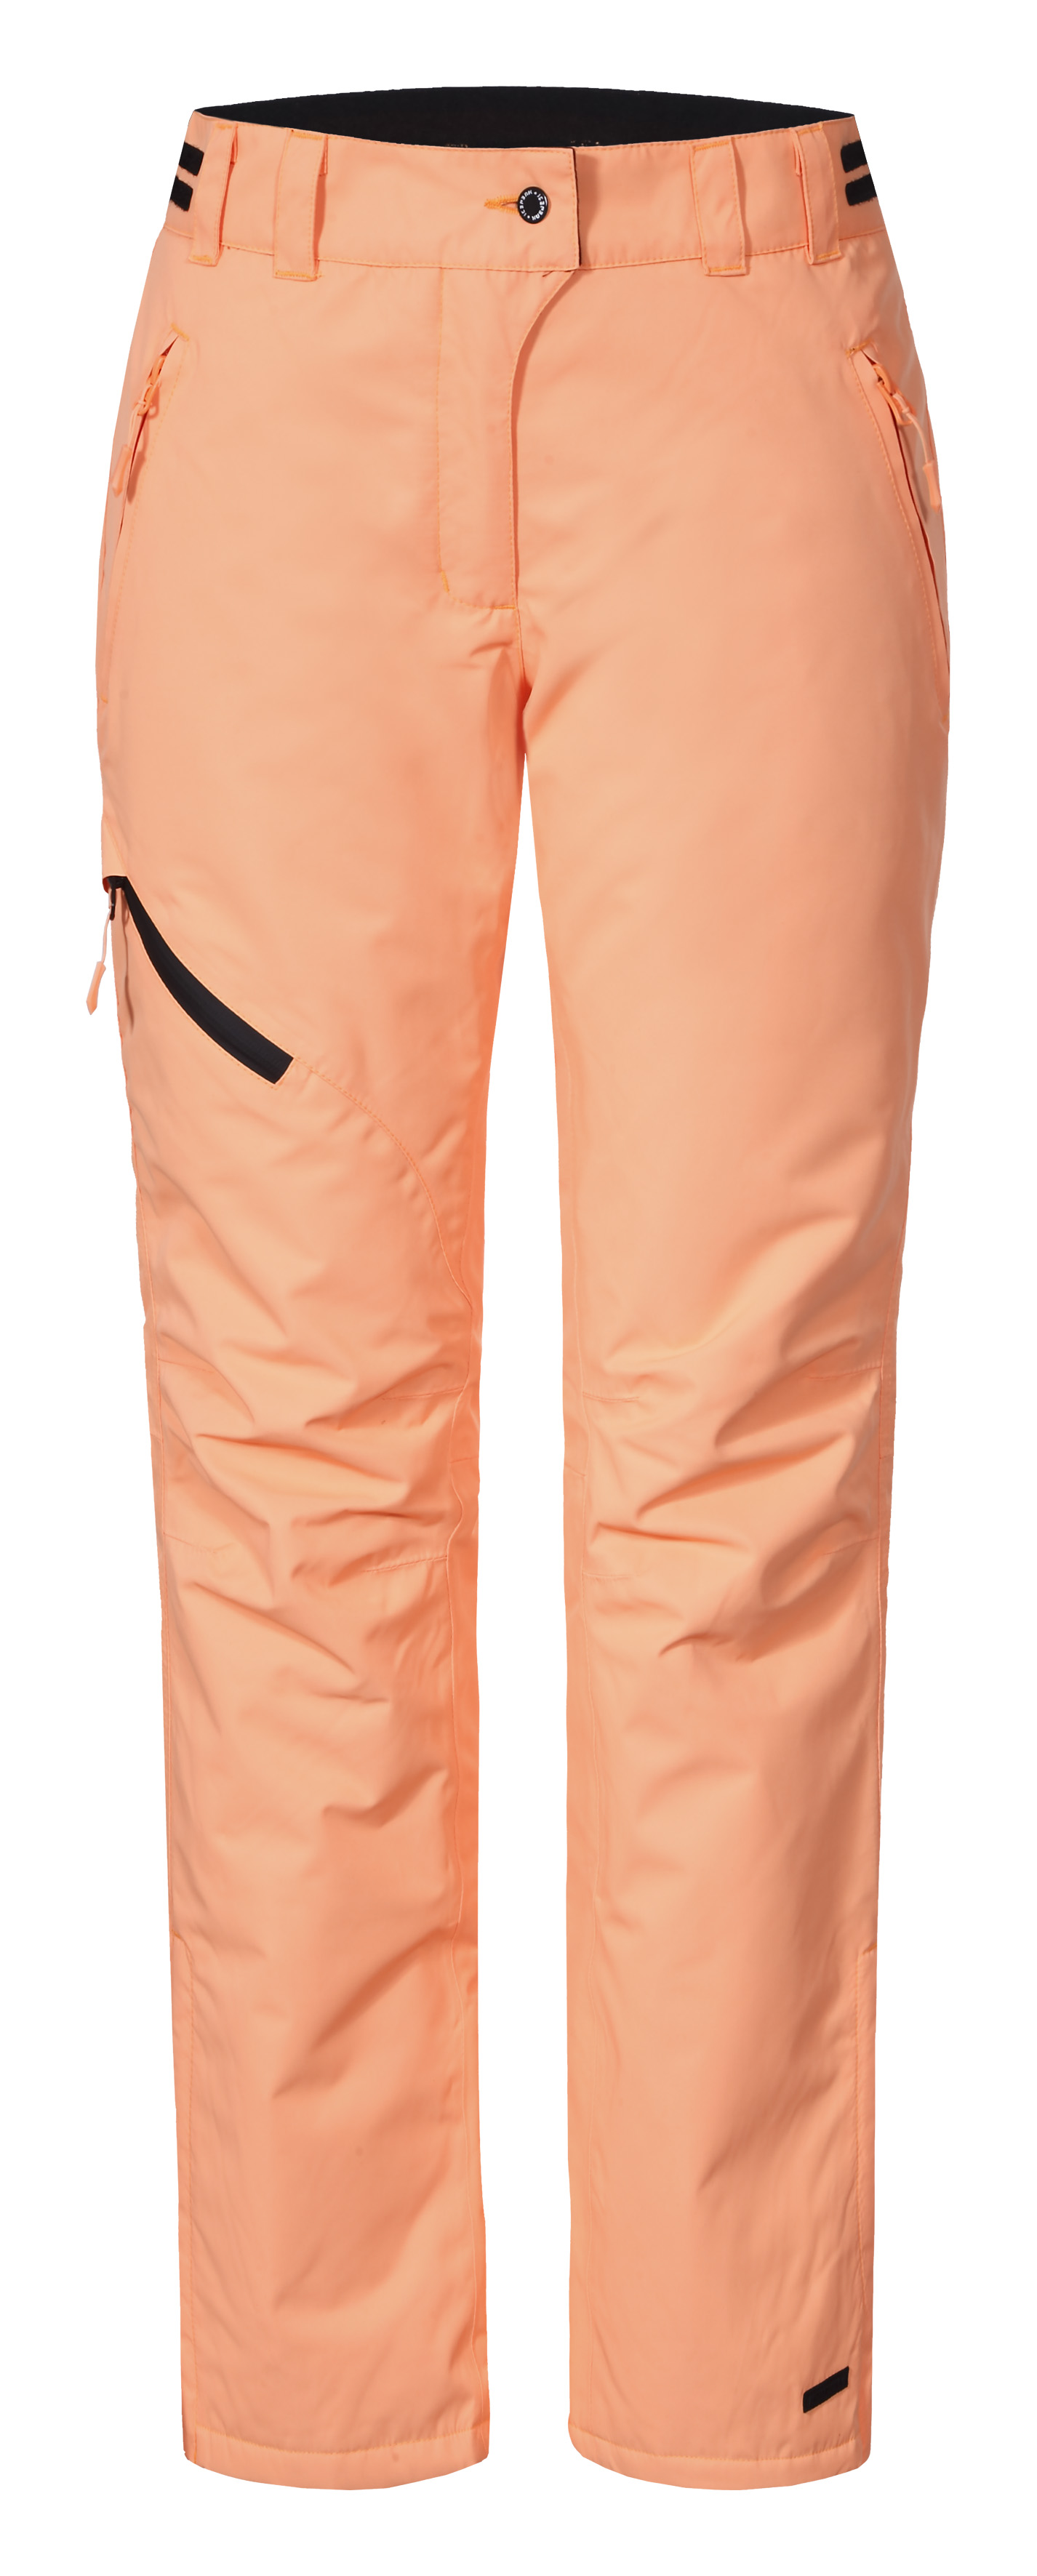 Image of   Icepeak Josie Wadded Trousers women - Abricot